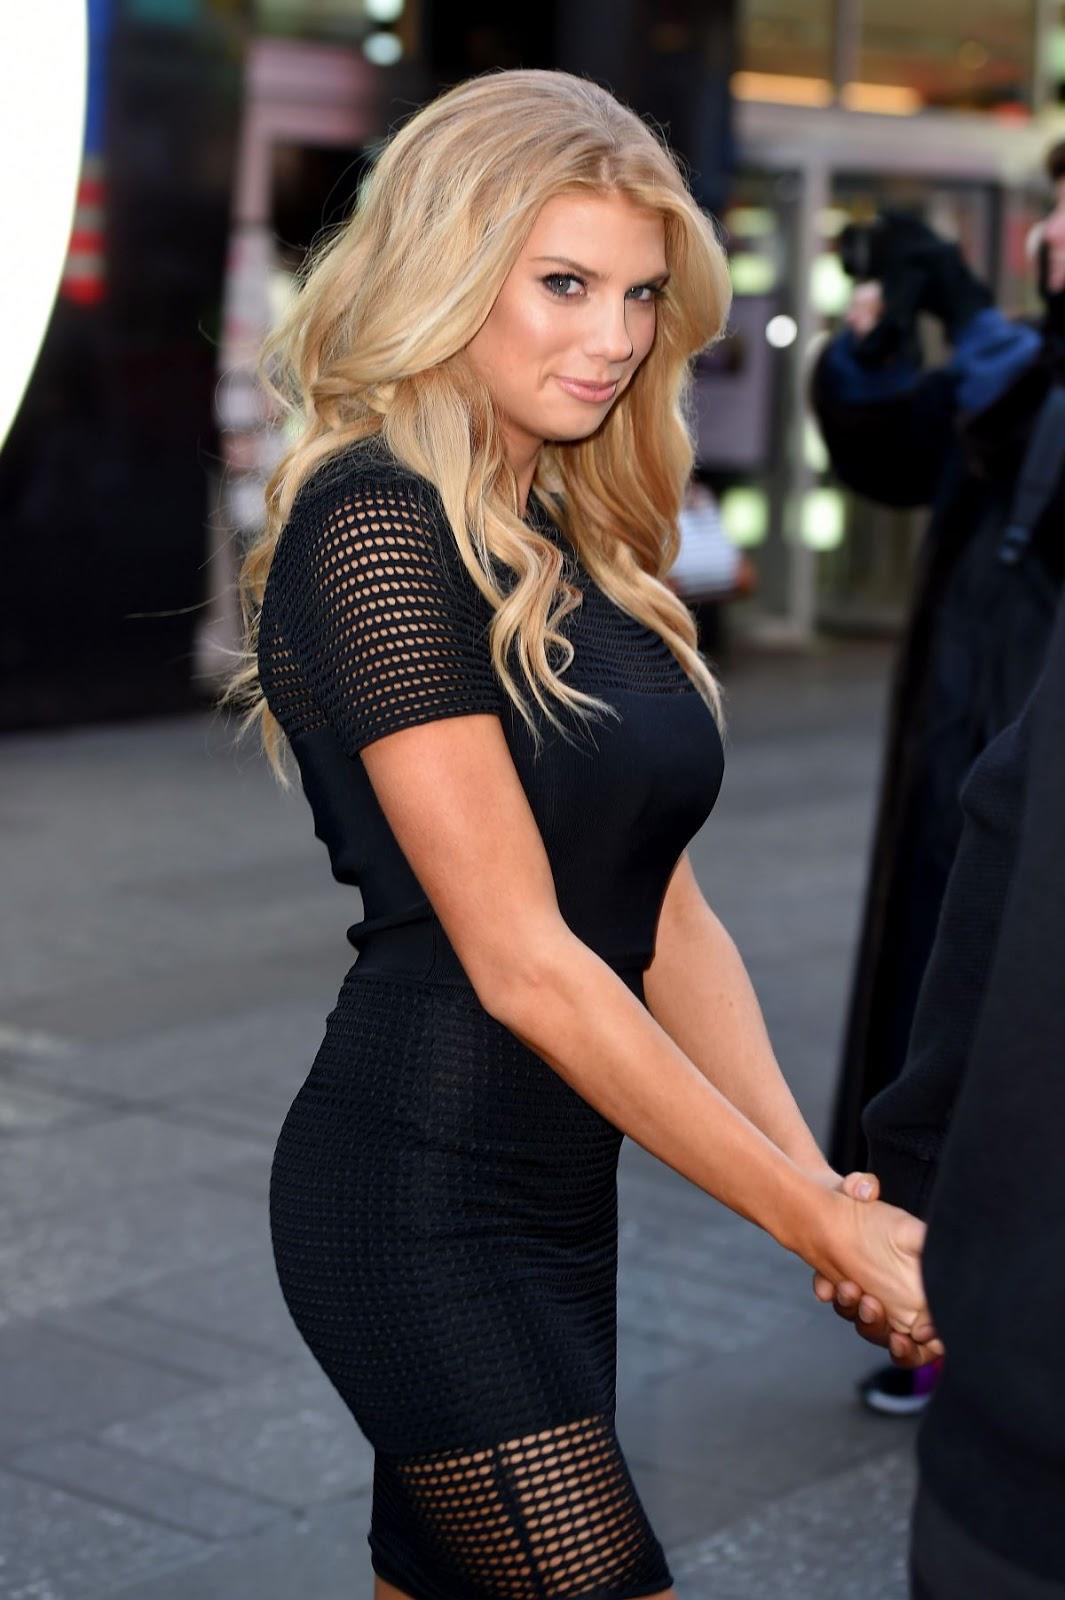 Full HQ Photos of Charlotte Mckinney in Black dress at Good Morning America